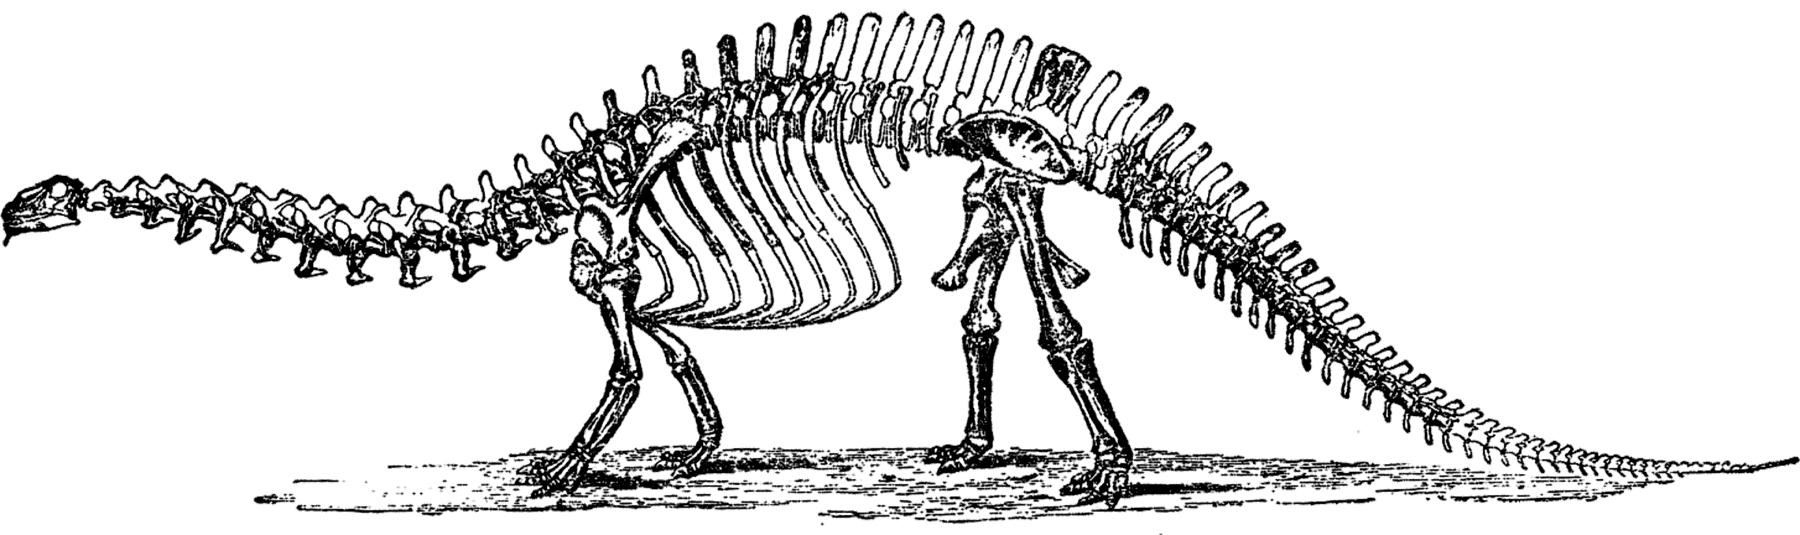 picture triceratops public domain dinosaur bones image stegosaurus vintage triceratops picture